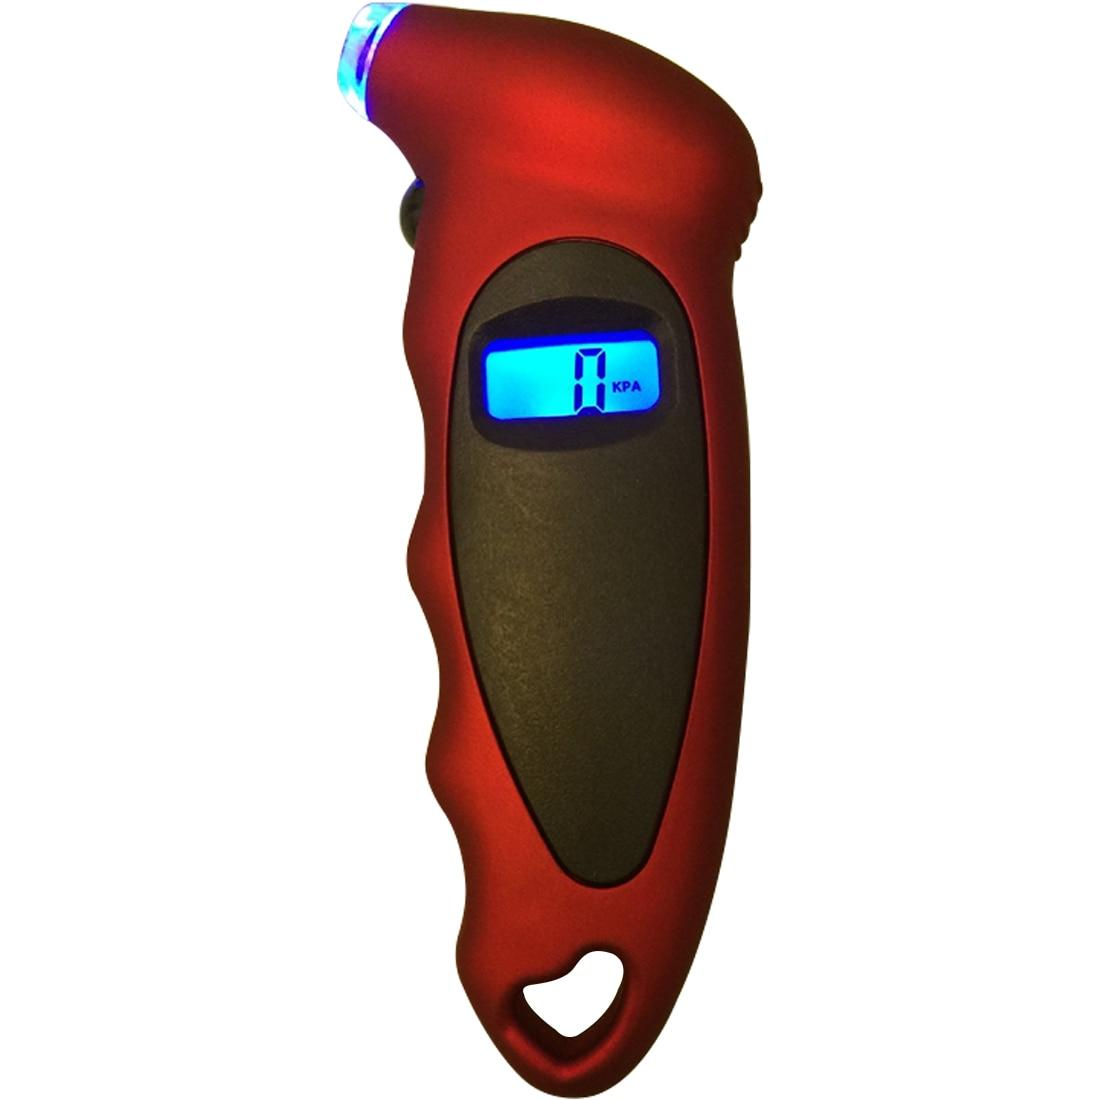 Car Motorcycle Bike Mini Digital Tire Gauge Tire Diagnostic LCD Display Car Digital Tire Pressure Tool Gauge